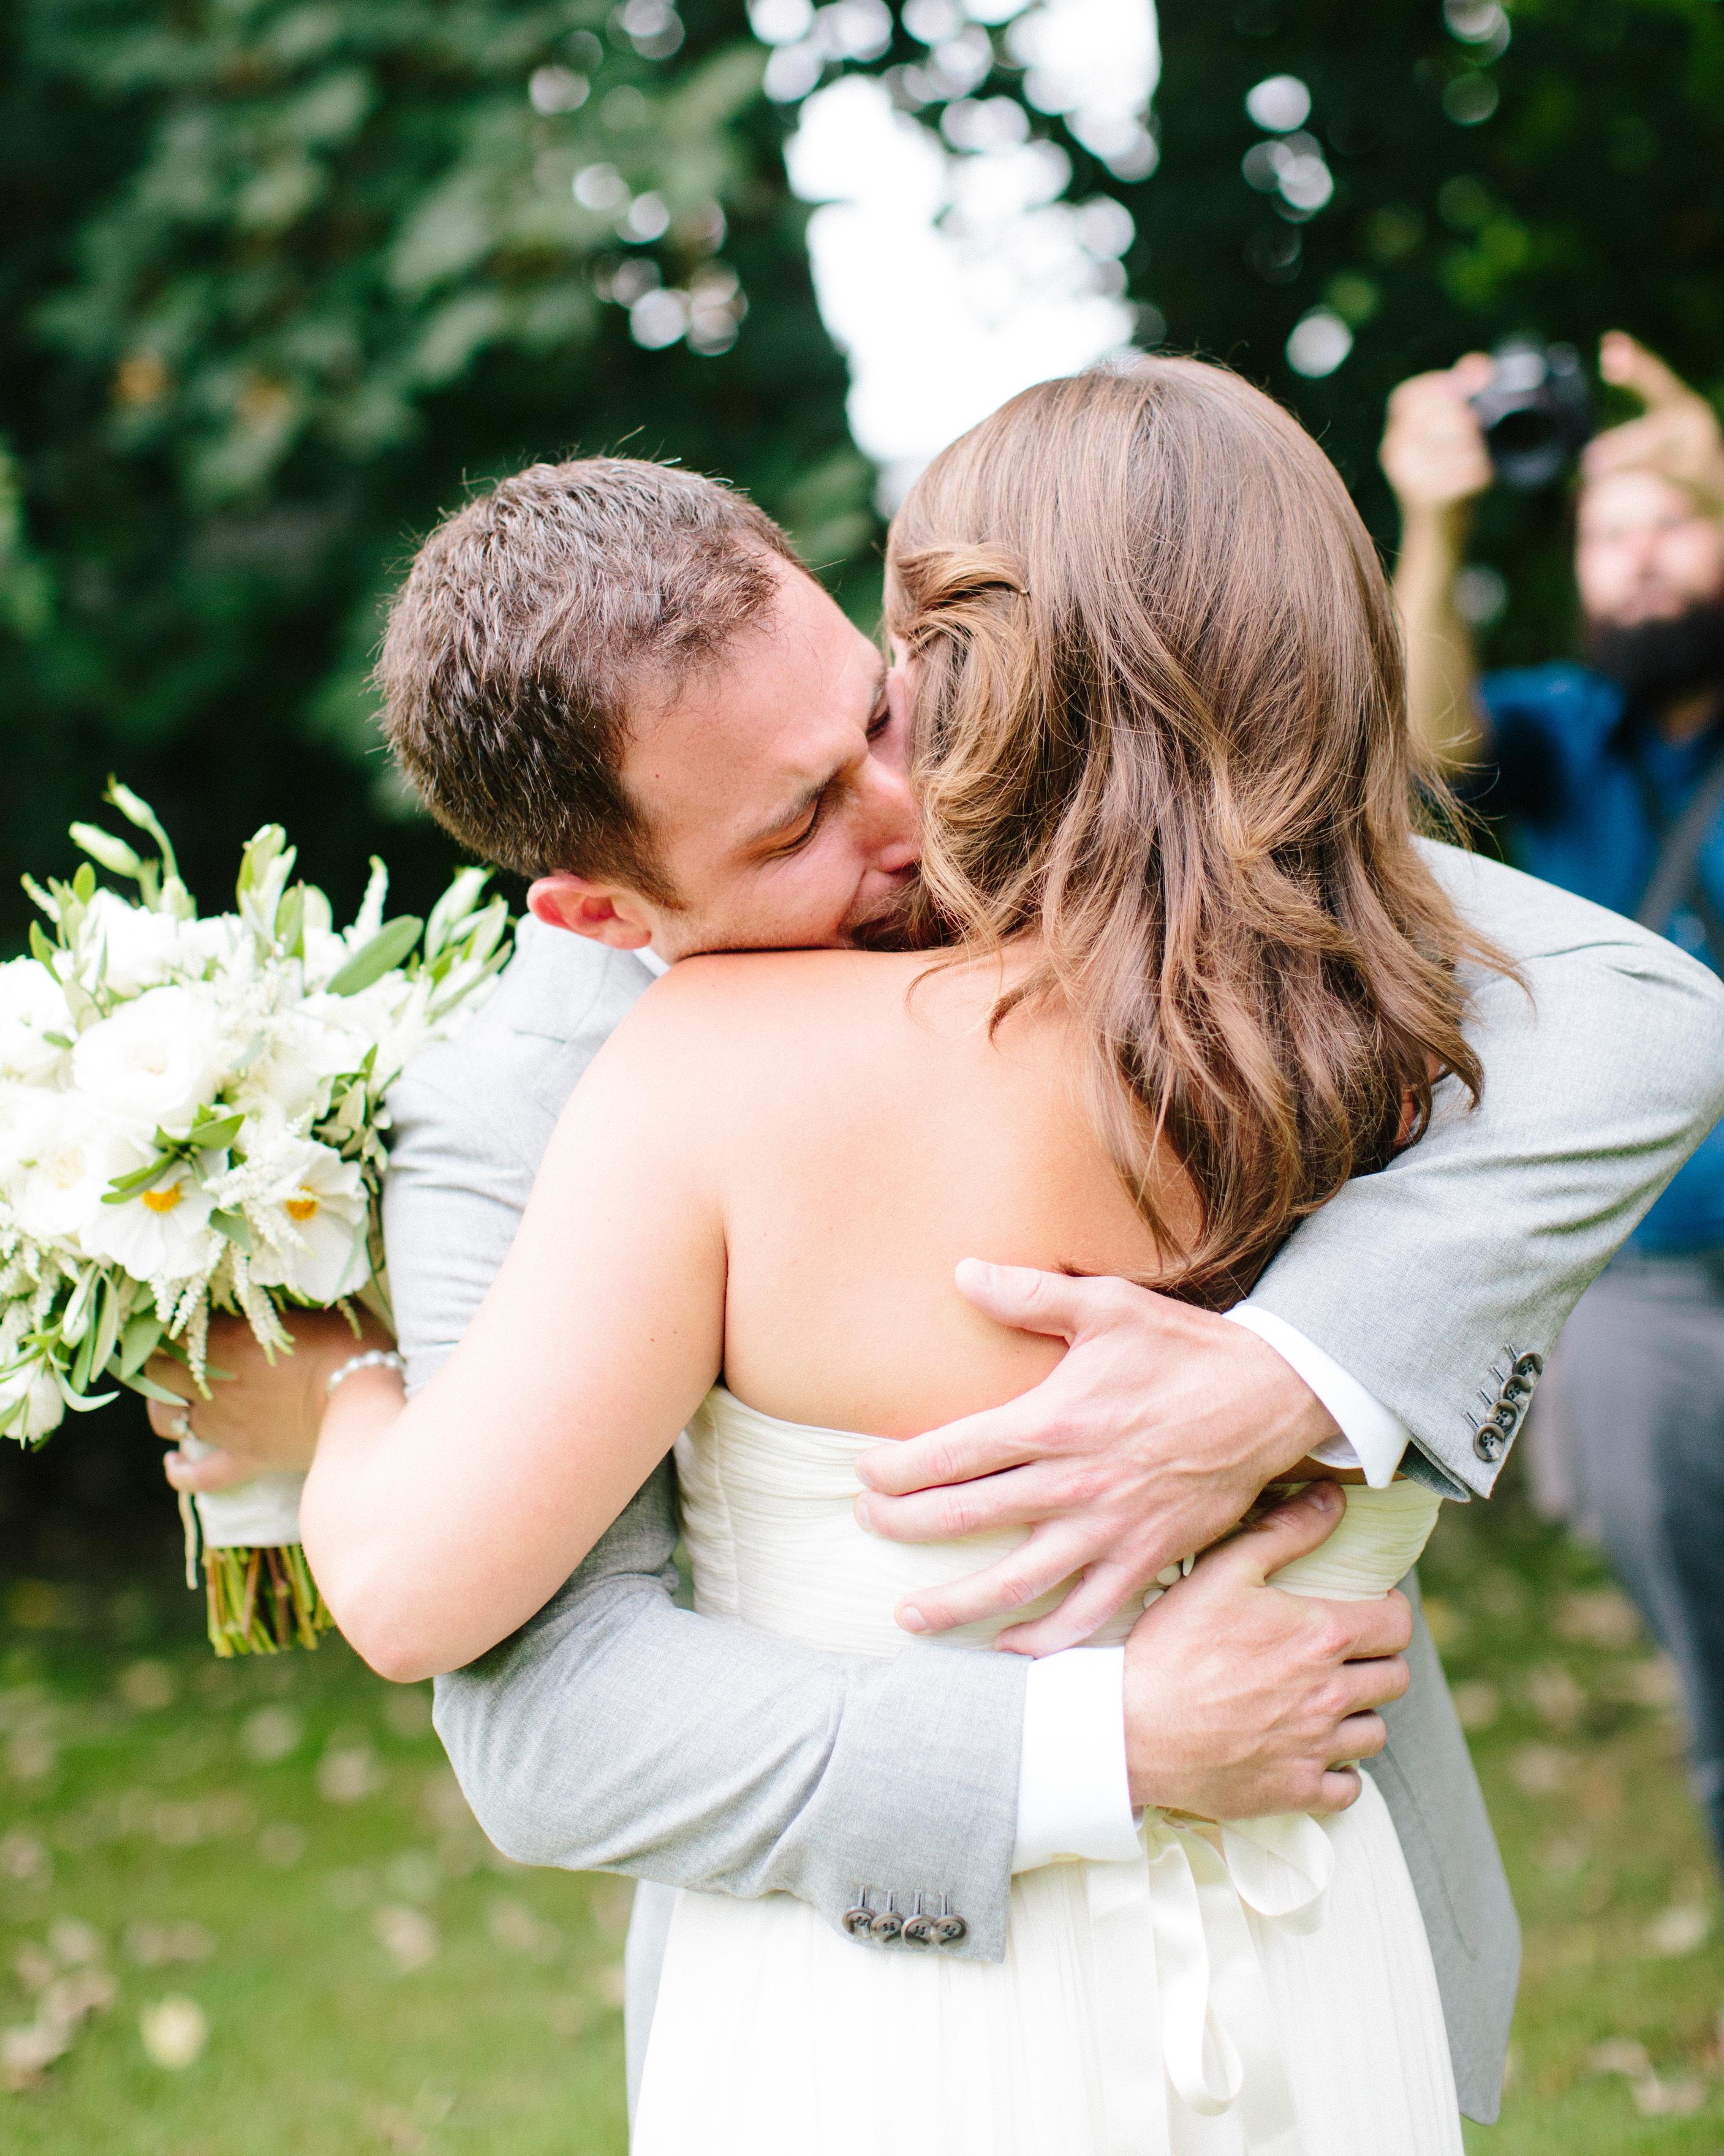 kristen-jonathan-wedding-firstlook-0507-s112193-1015.jpg